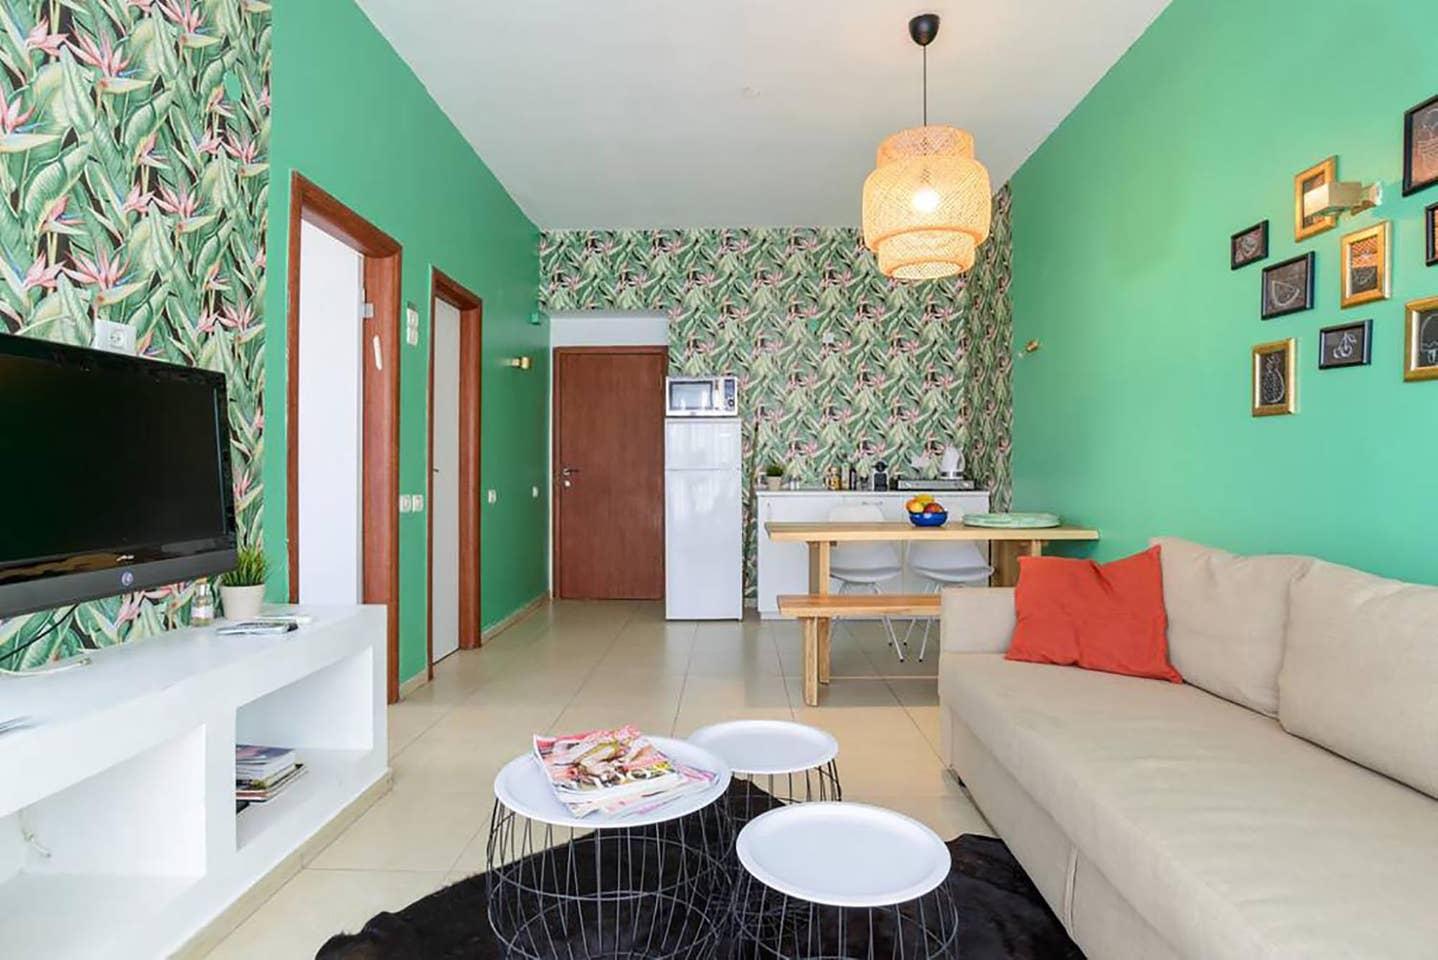 Apartment Tropical sensation next to the beach TLV photo 18454300